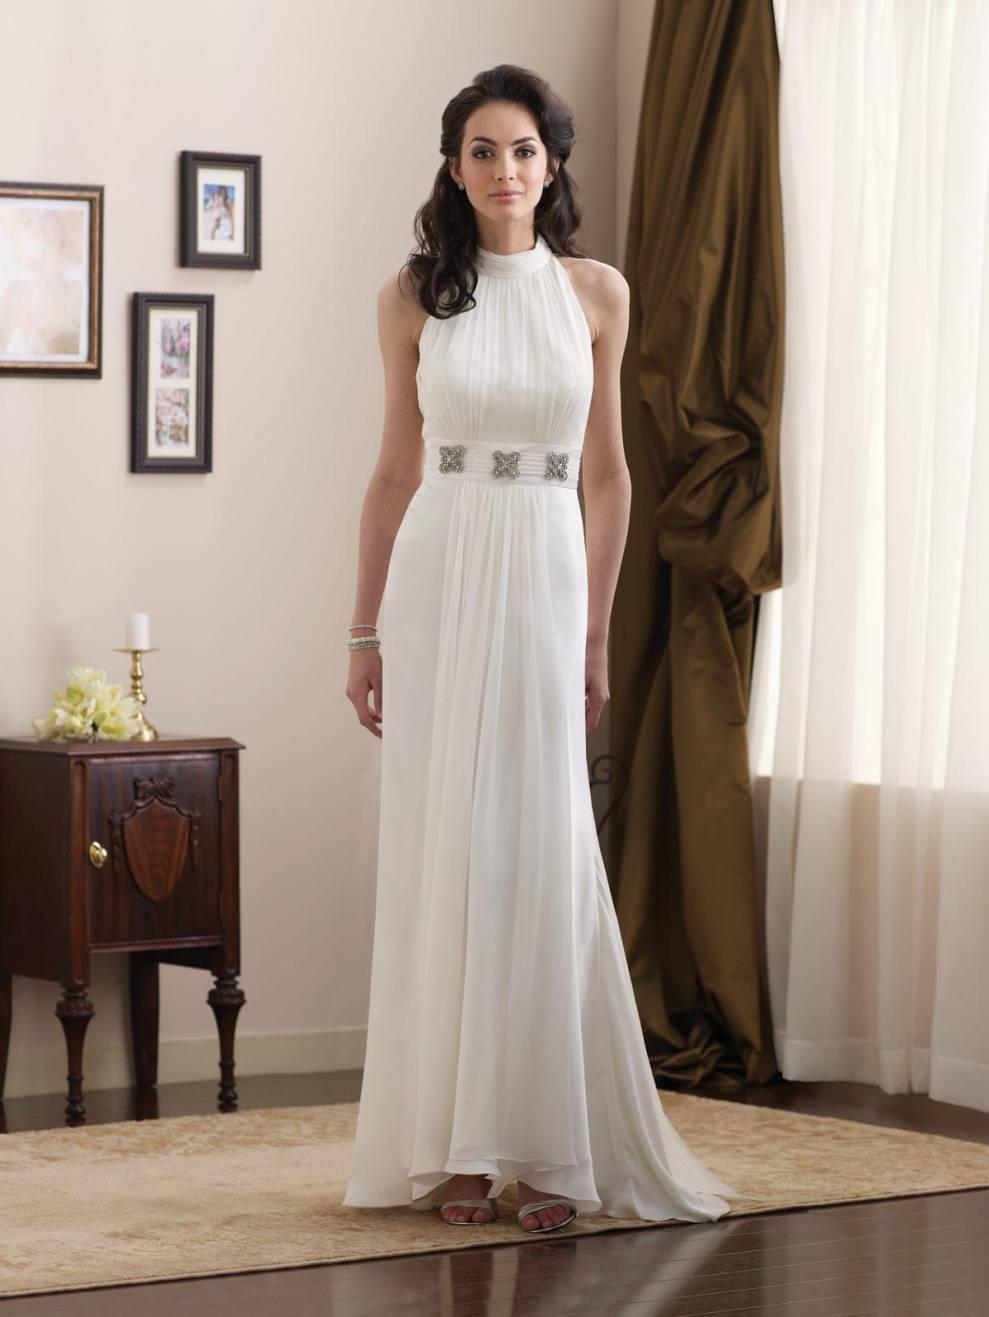 Simple High Halter Jeweled Broach Chiffon Informal Wedding Dress  zoombridalcom  PRLog